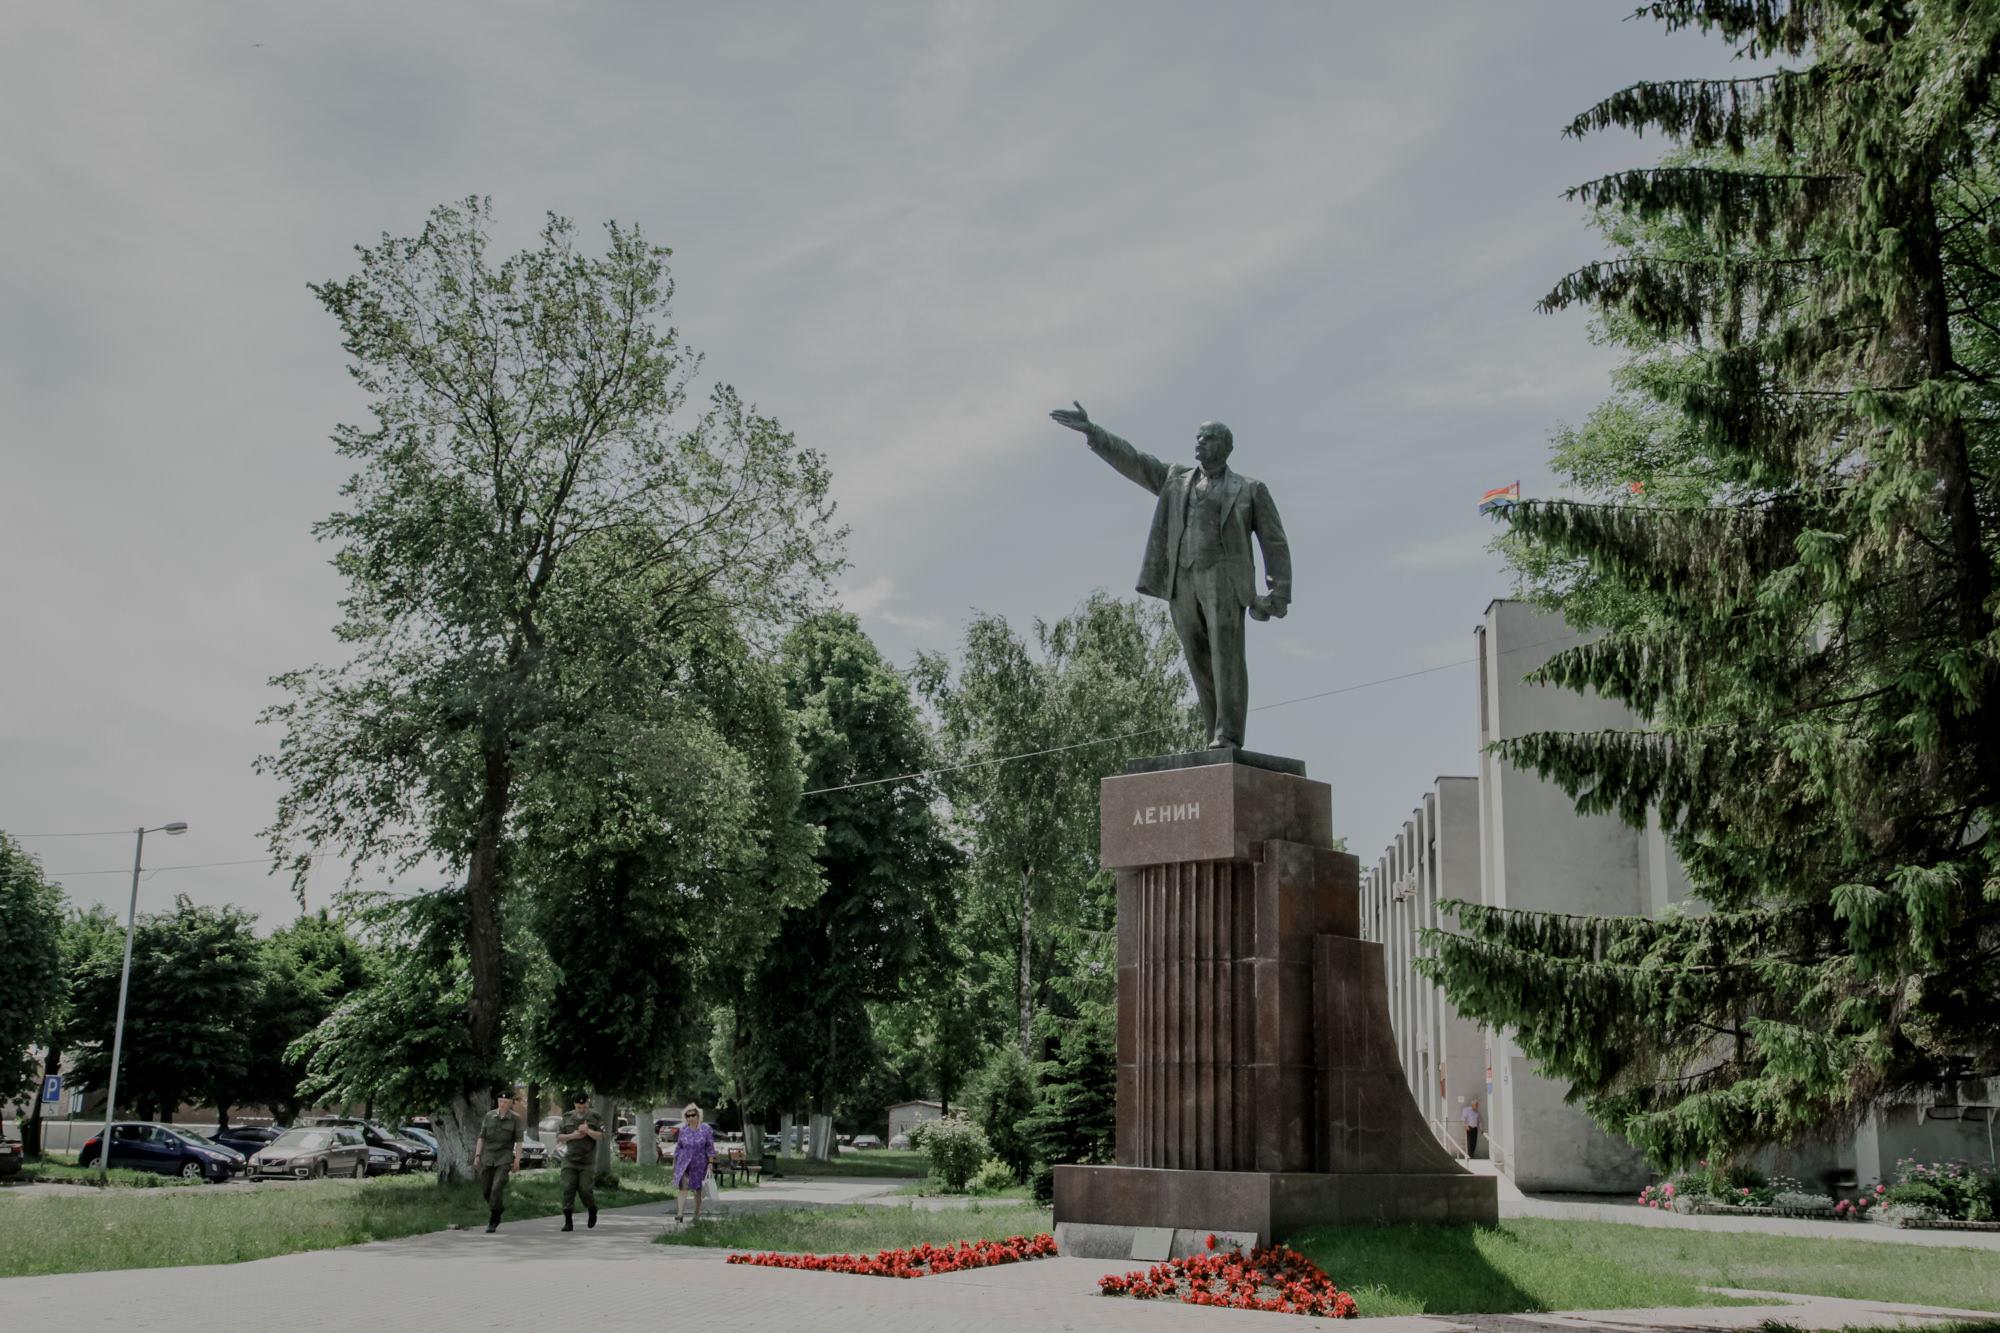 Pomnik Lenina w Bałtijsku